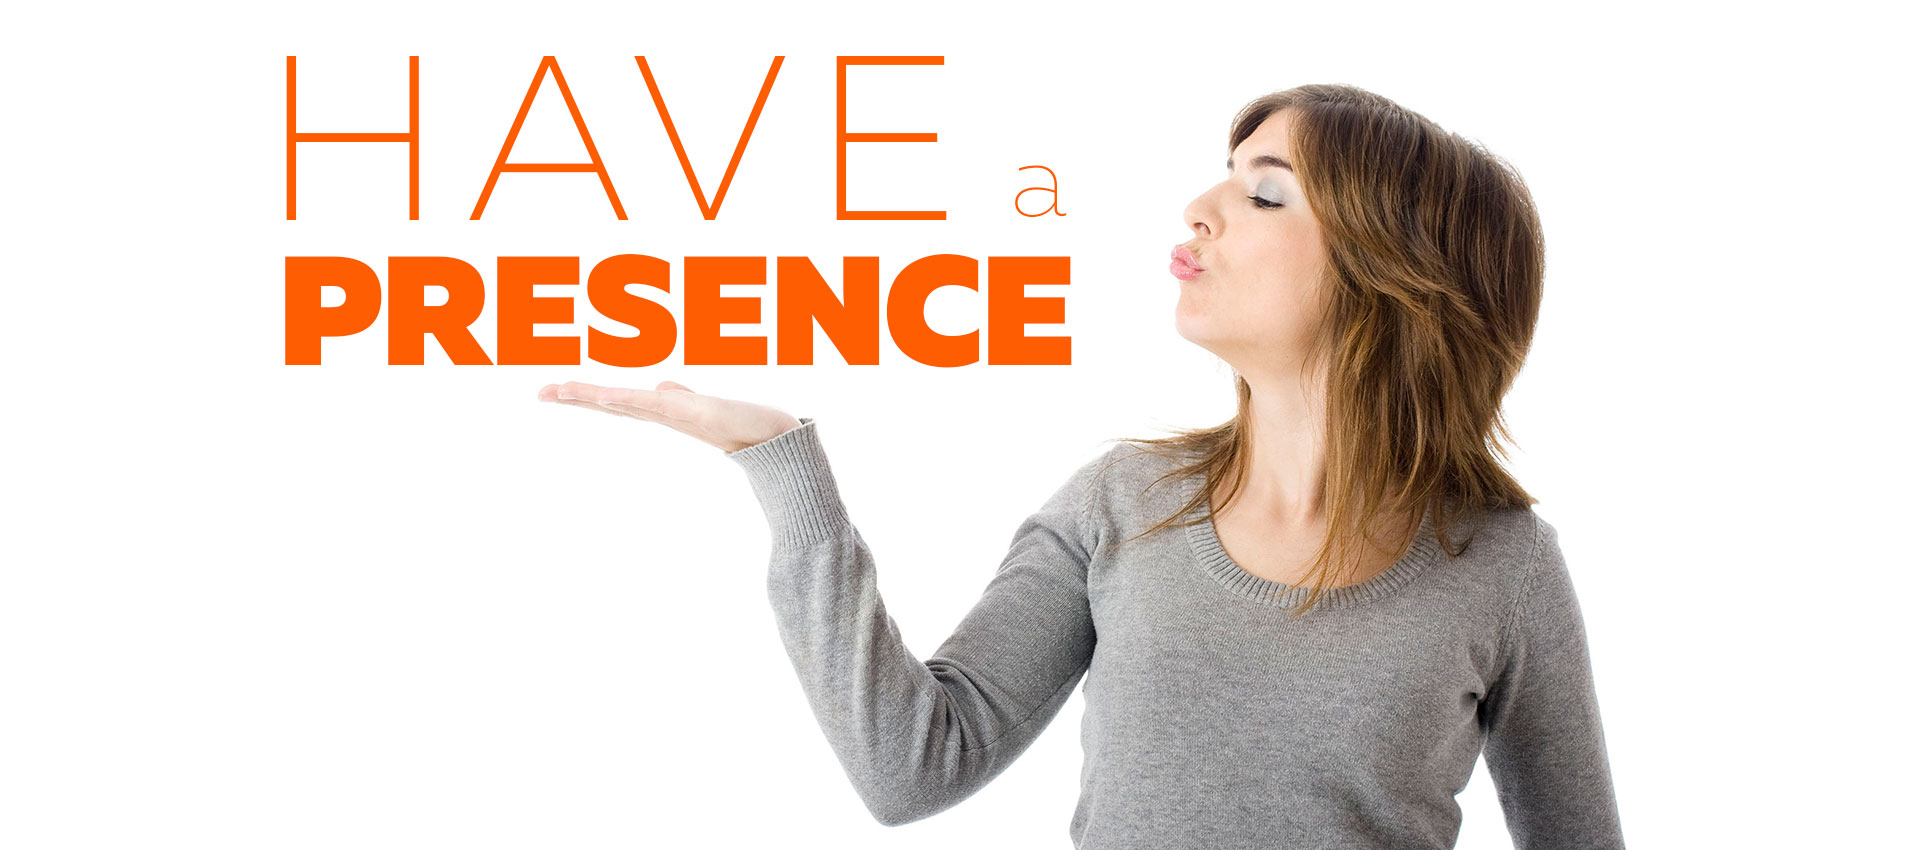 sl-v2-presence1